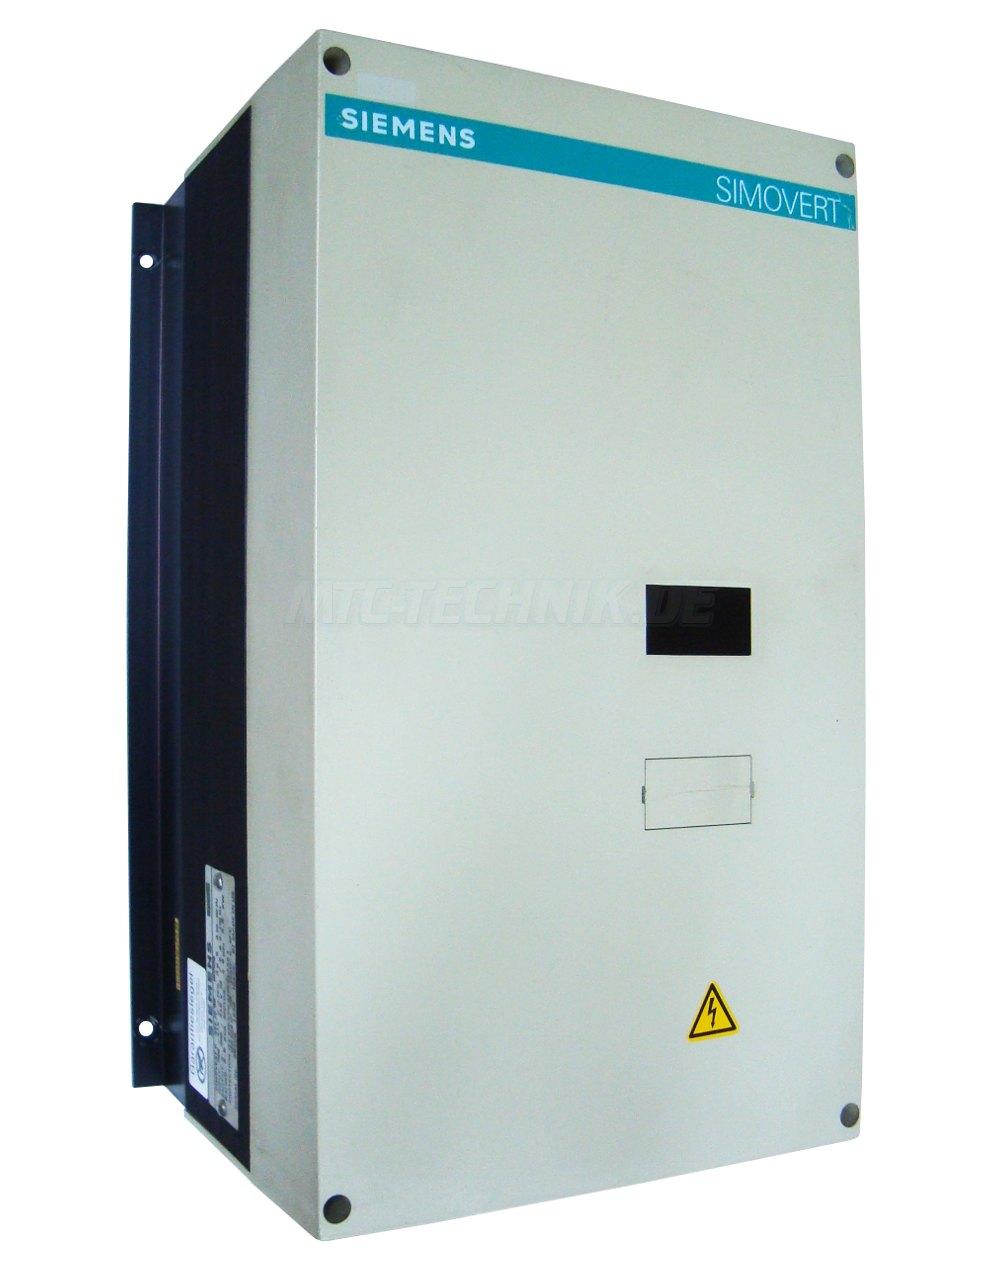 1 Siemens 6se2005-2aa00 Online Shop Frequenzumrichter